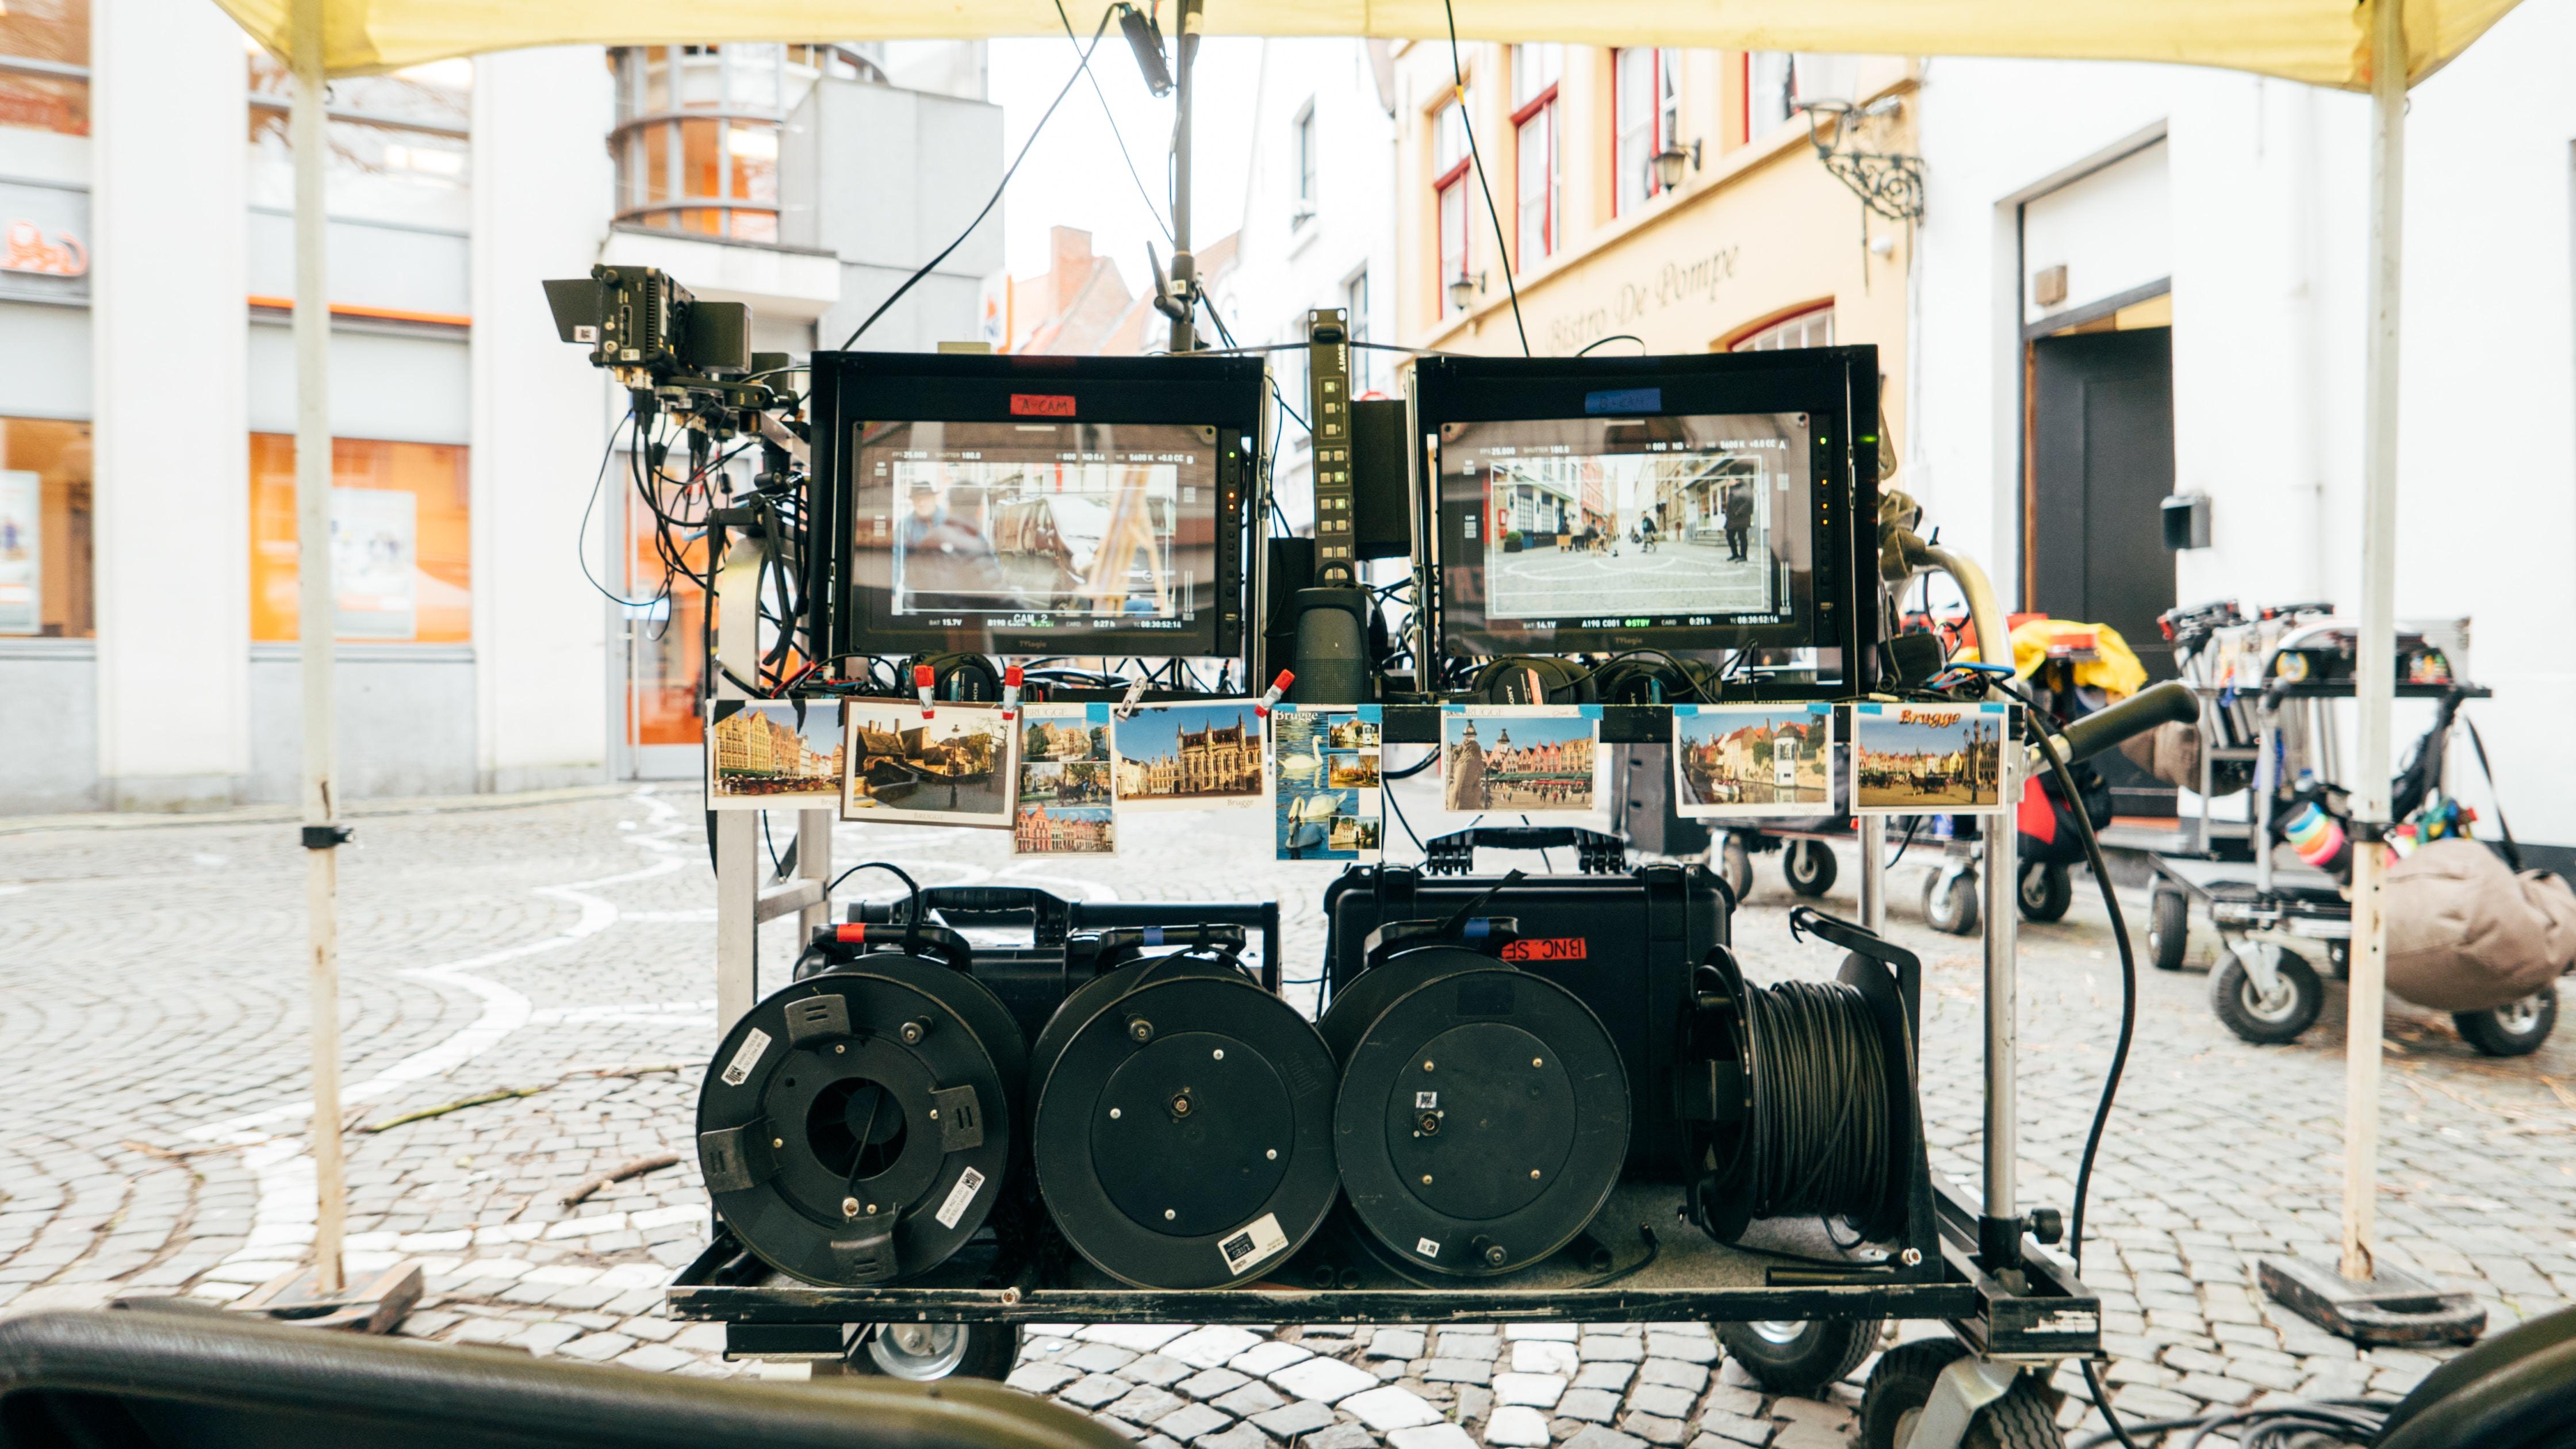 Professional film equipment. Photo by Daan Stevens on Unsplash